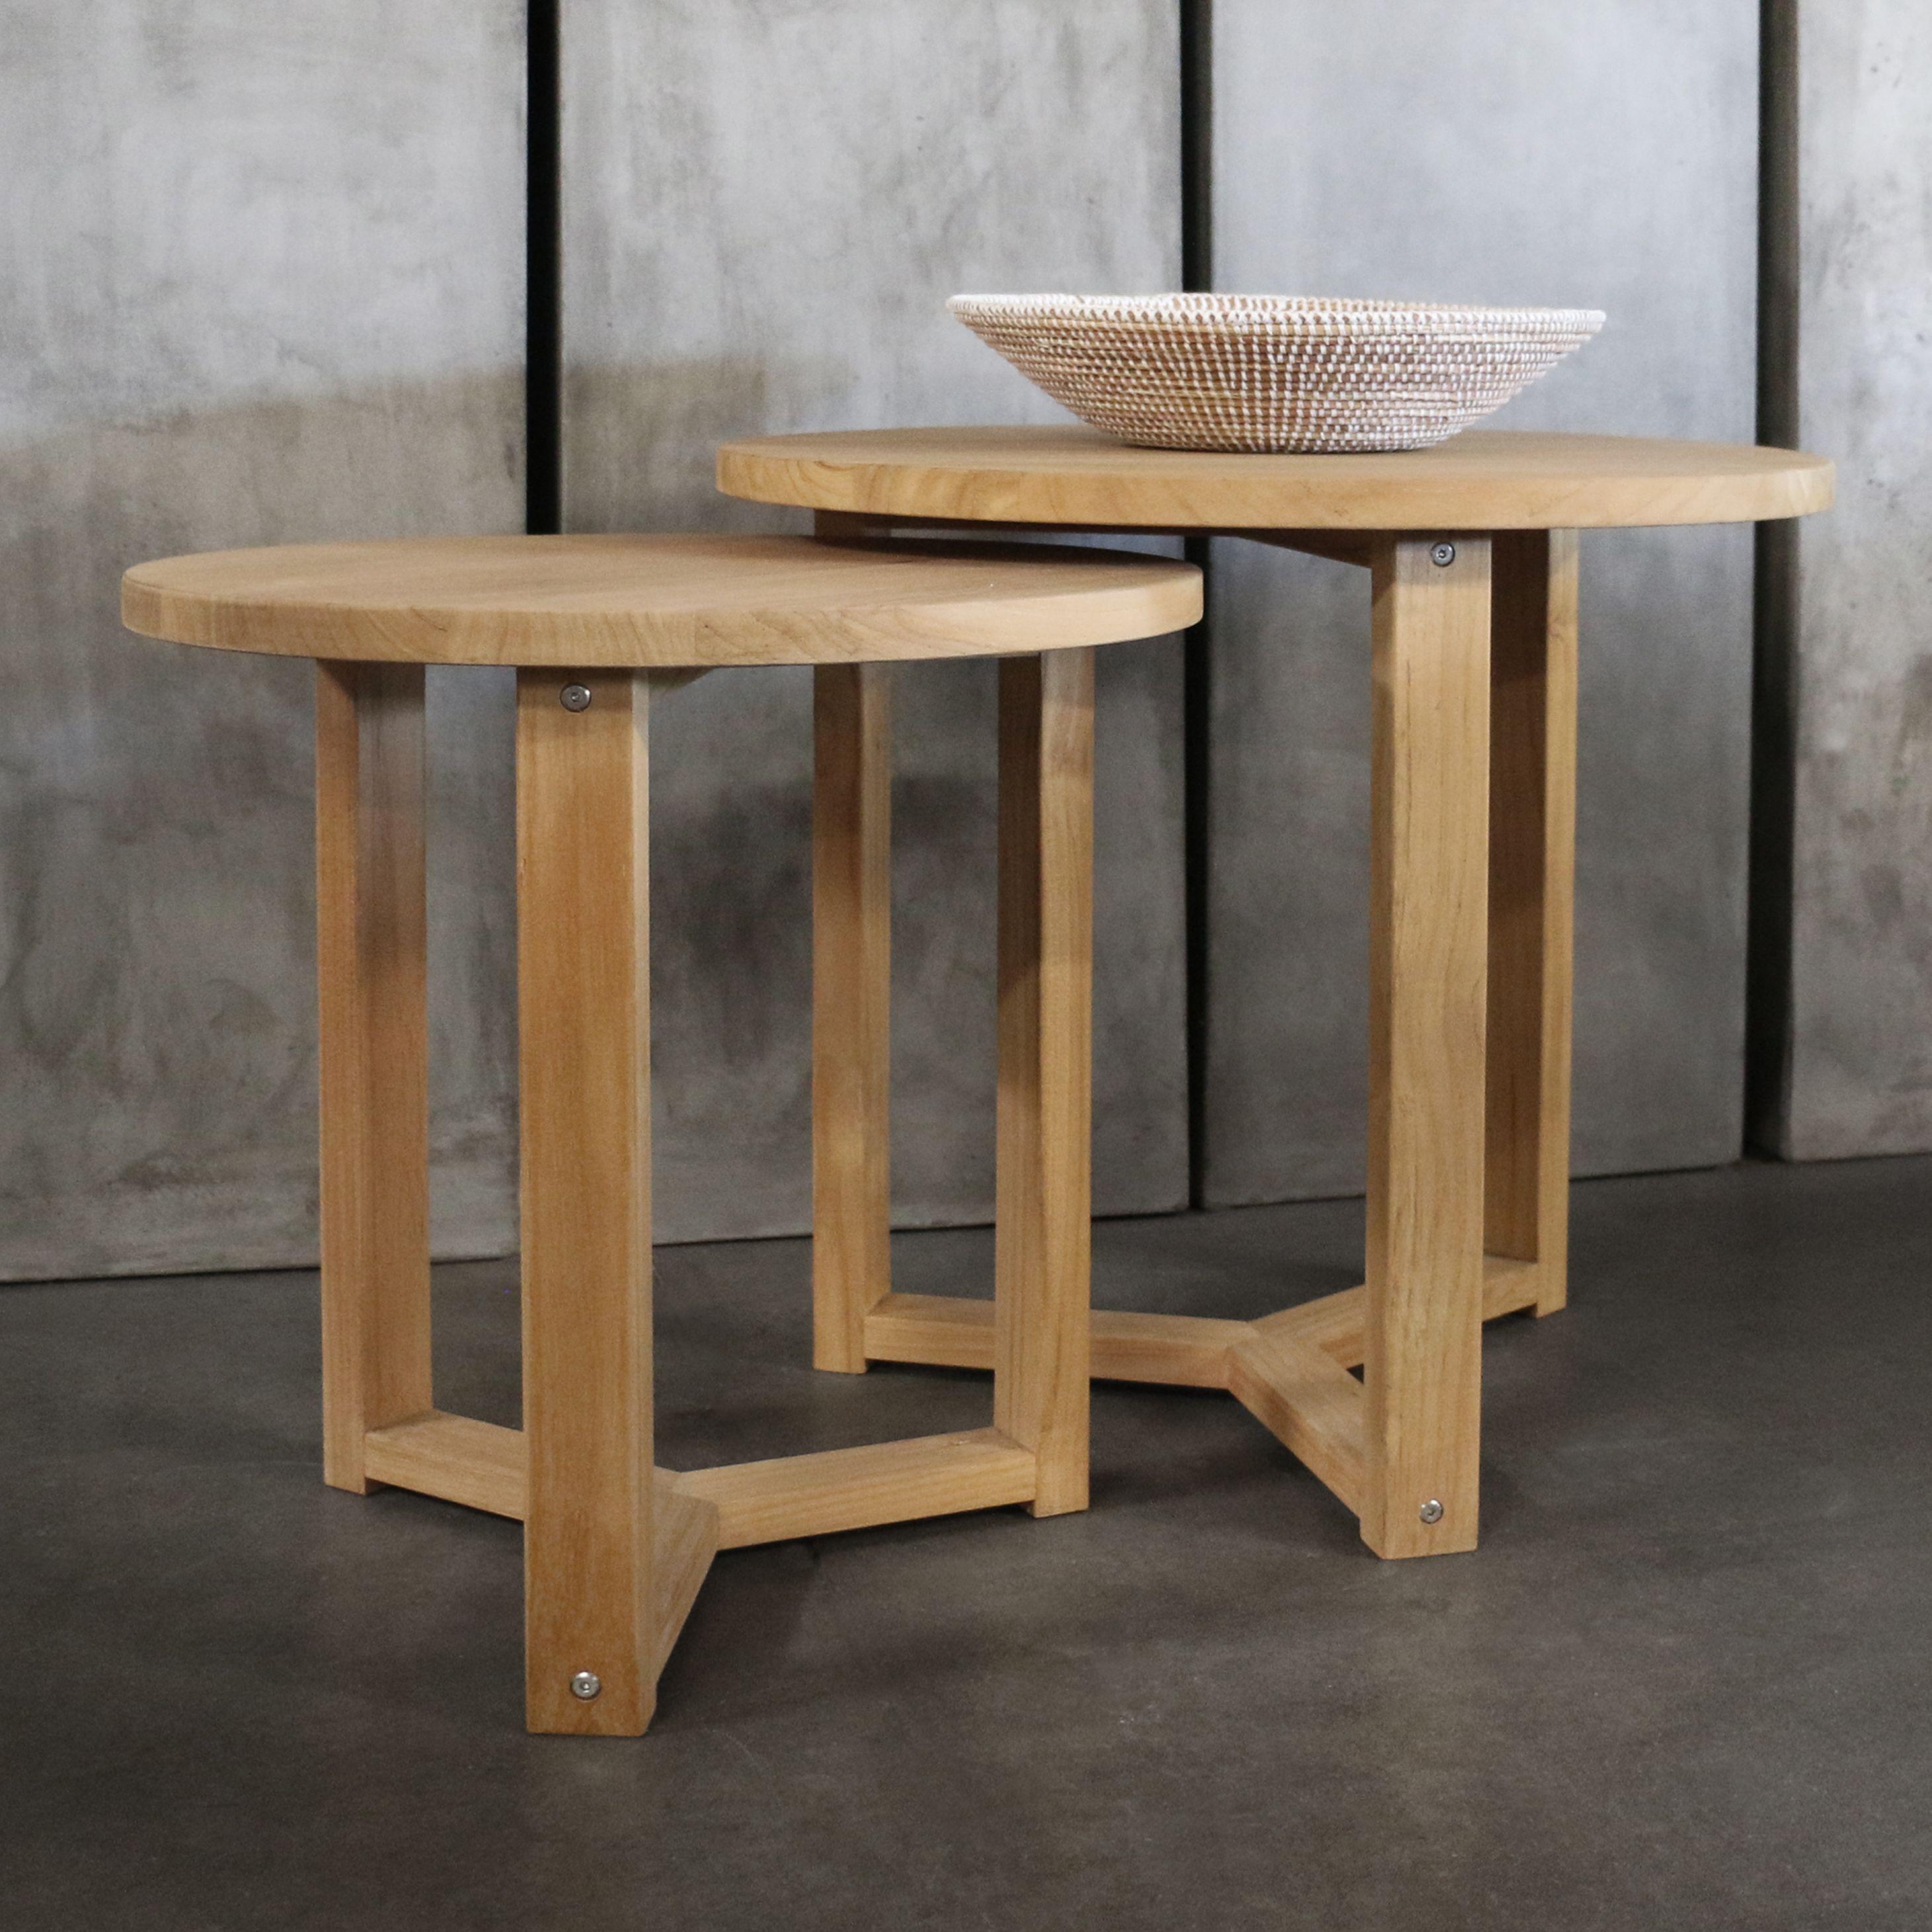 Ying Teak Accent Tables Teak Accent Table Teak Wood Side Table Teak Side Table